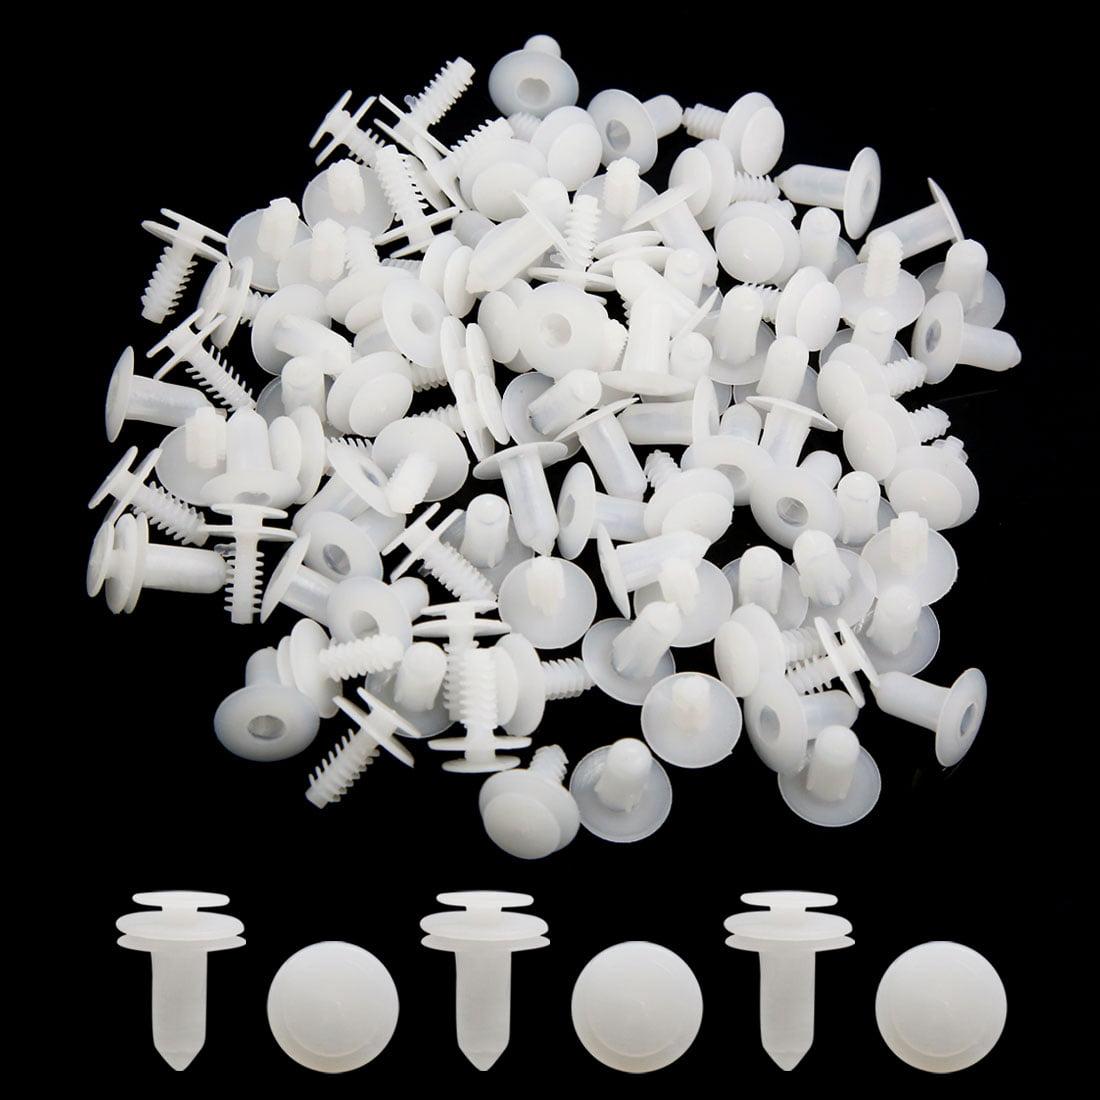 50Pcs Plastic Rivets Push Pin Type Bumper Fender Fastener Retainer White 9mm - image 1 of 2